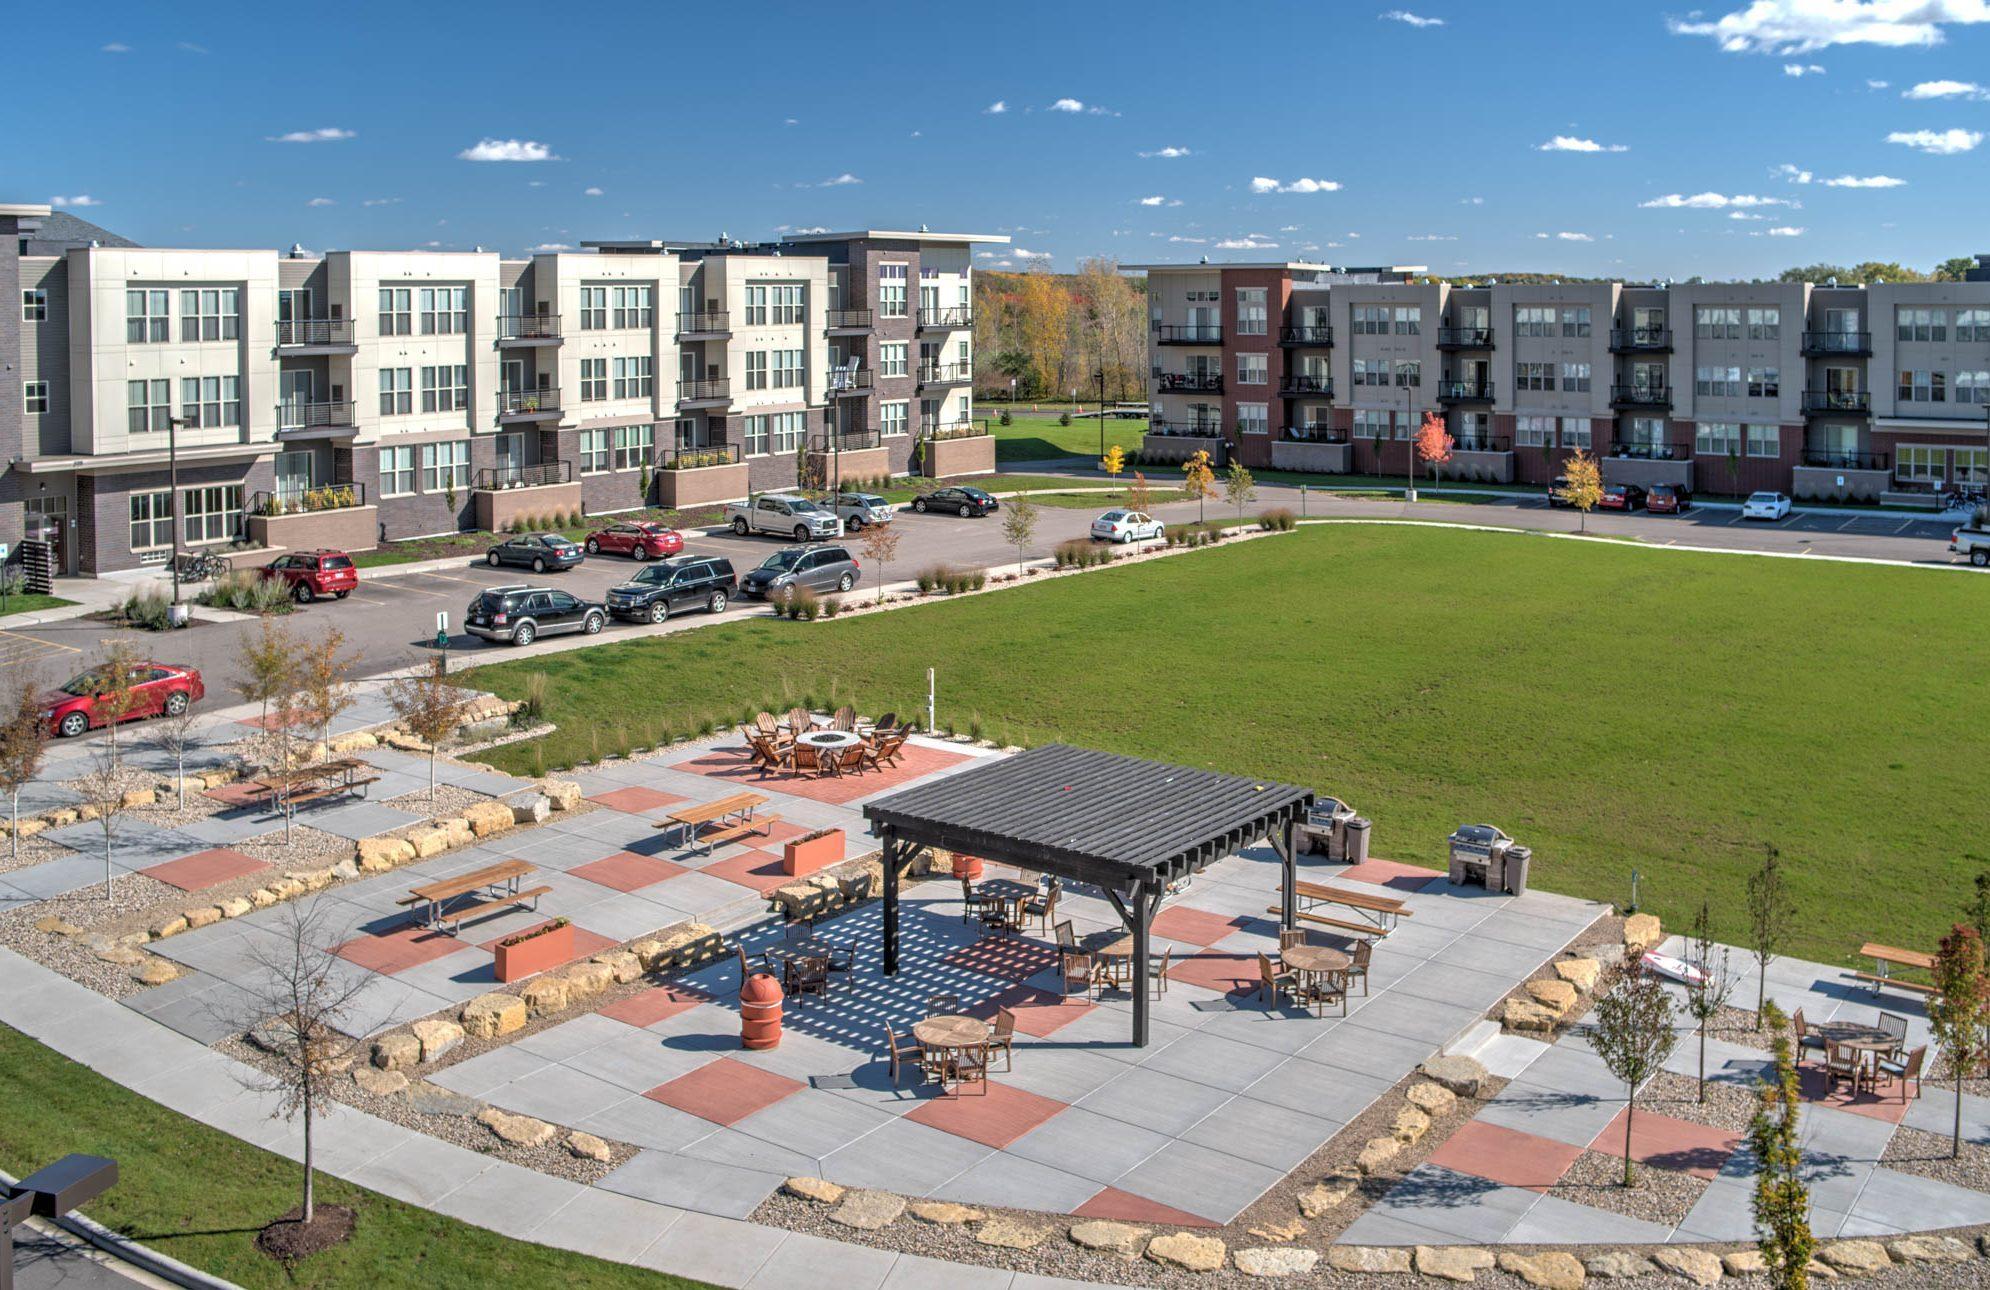 50twenty apartments green space